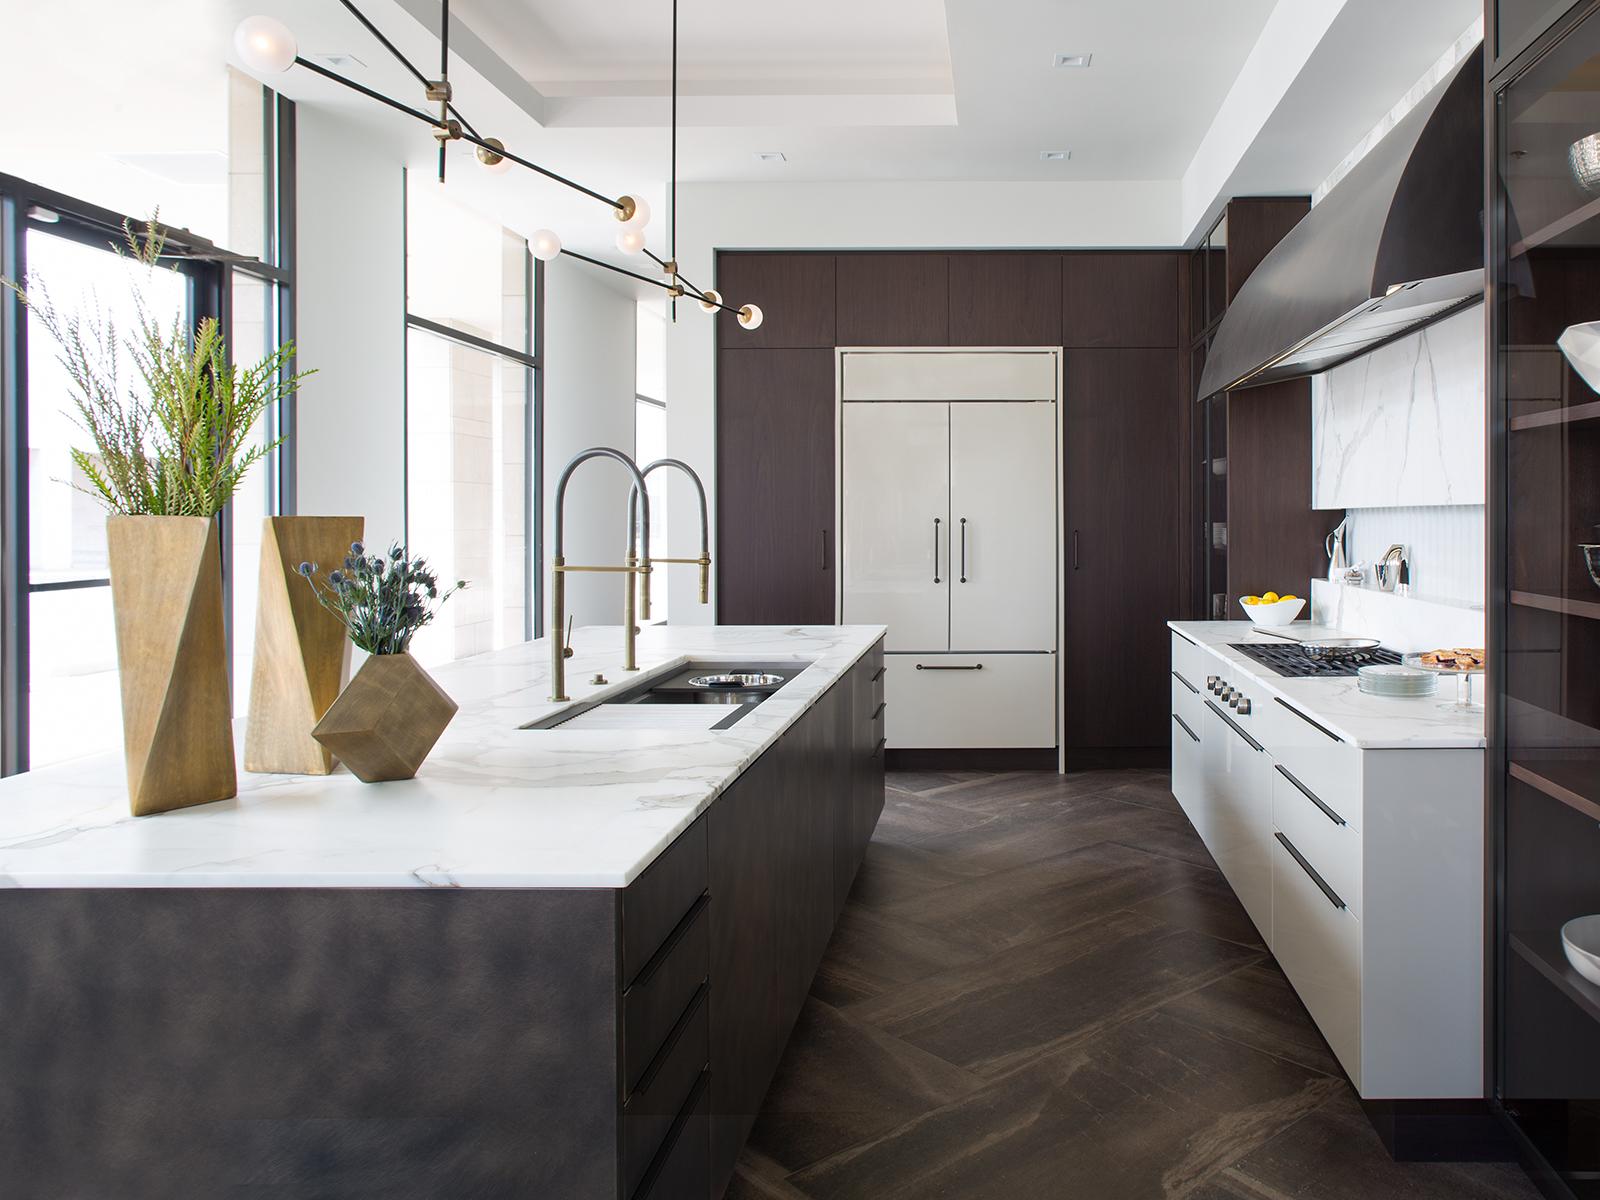 The Best Showrooms For Your Renovation, Bathroom Showroom Denver